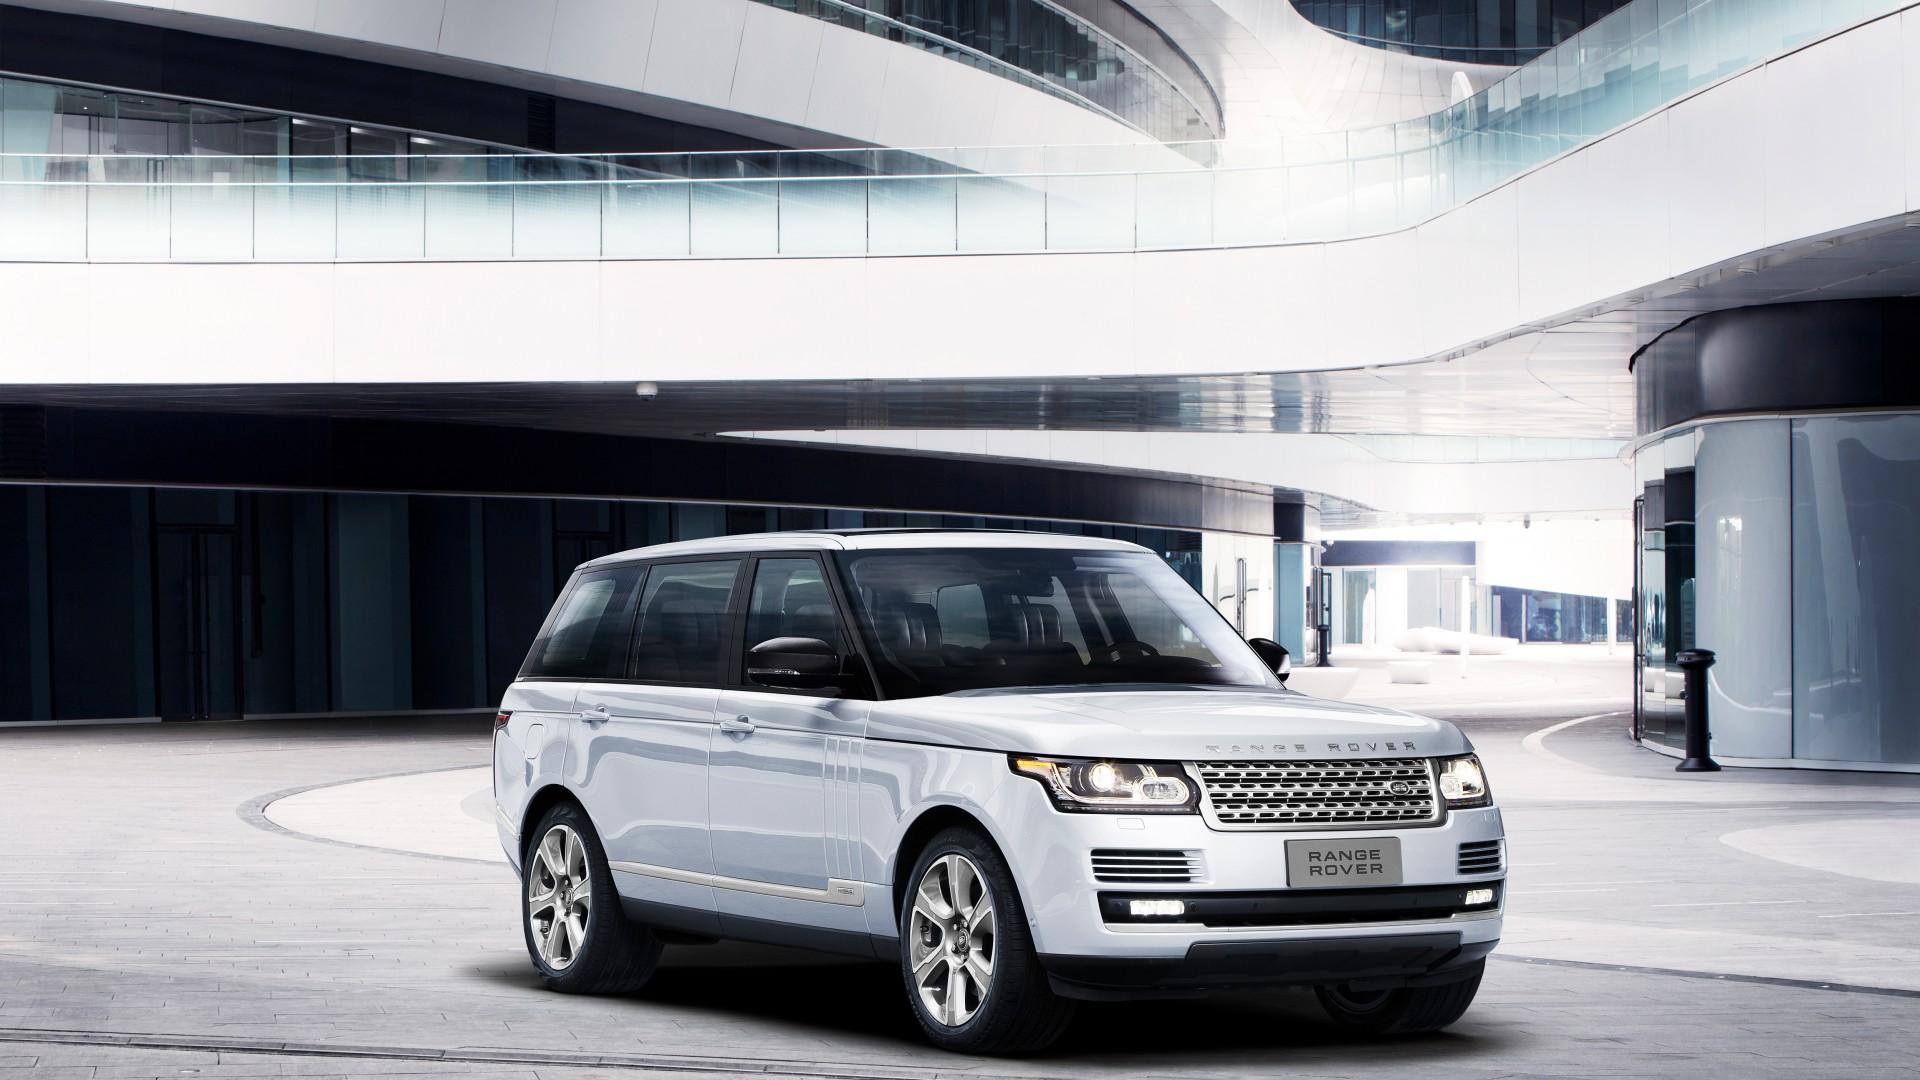 Range Rover Hybrid Long-Wheelbase